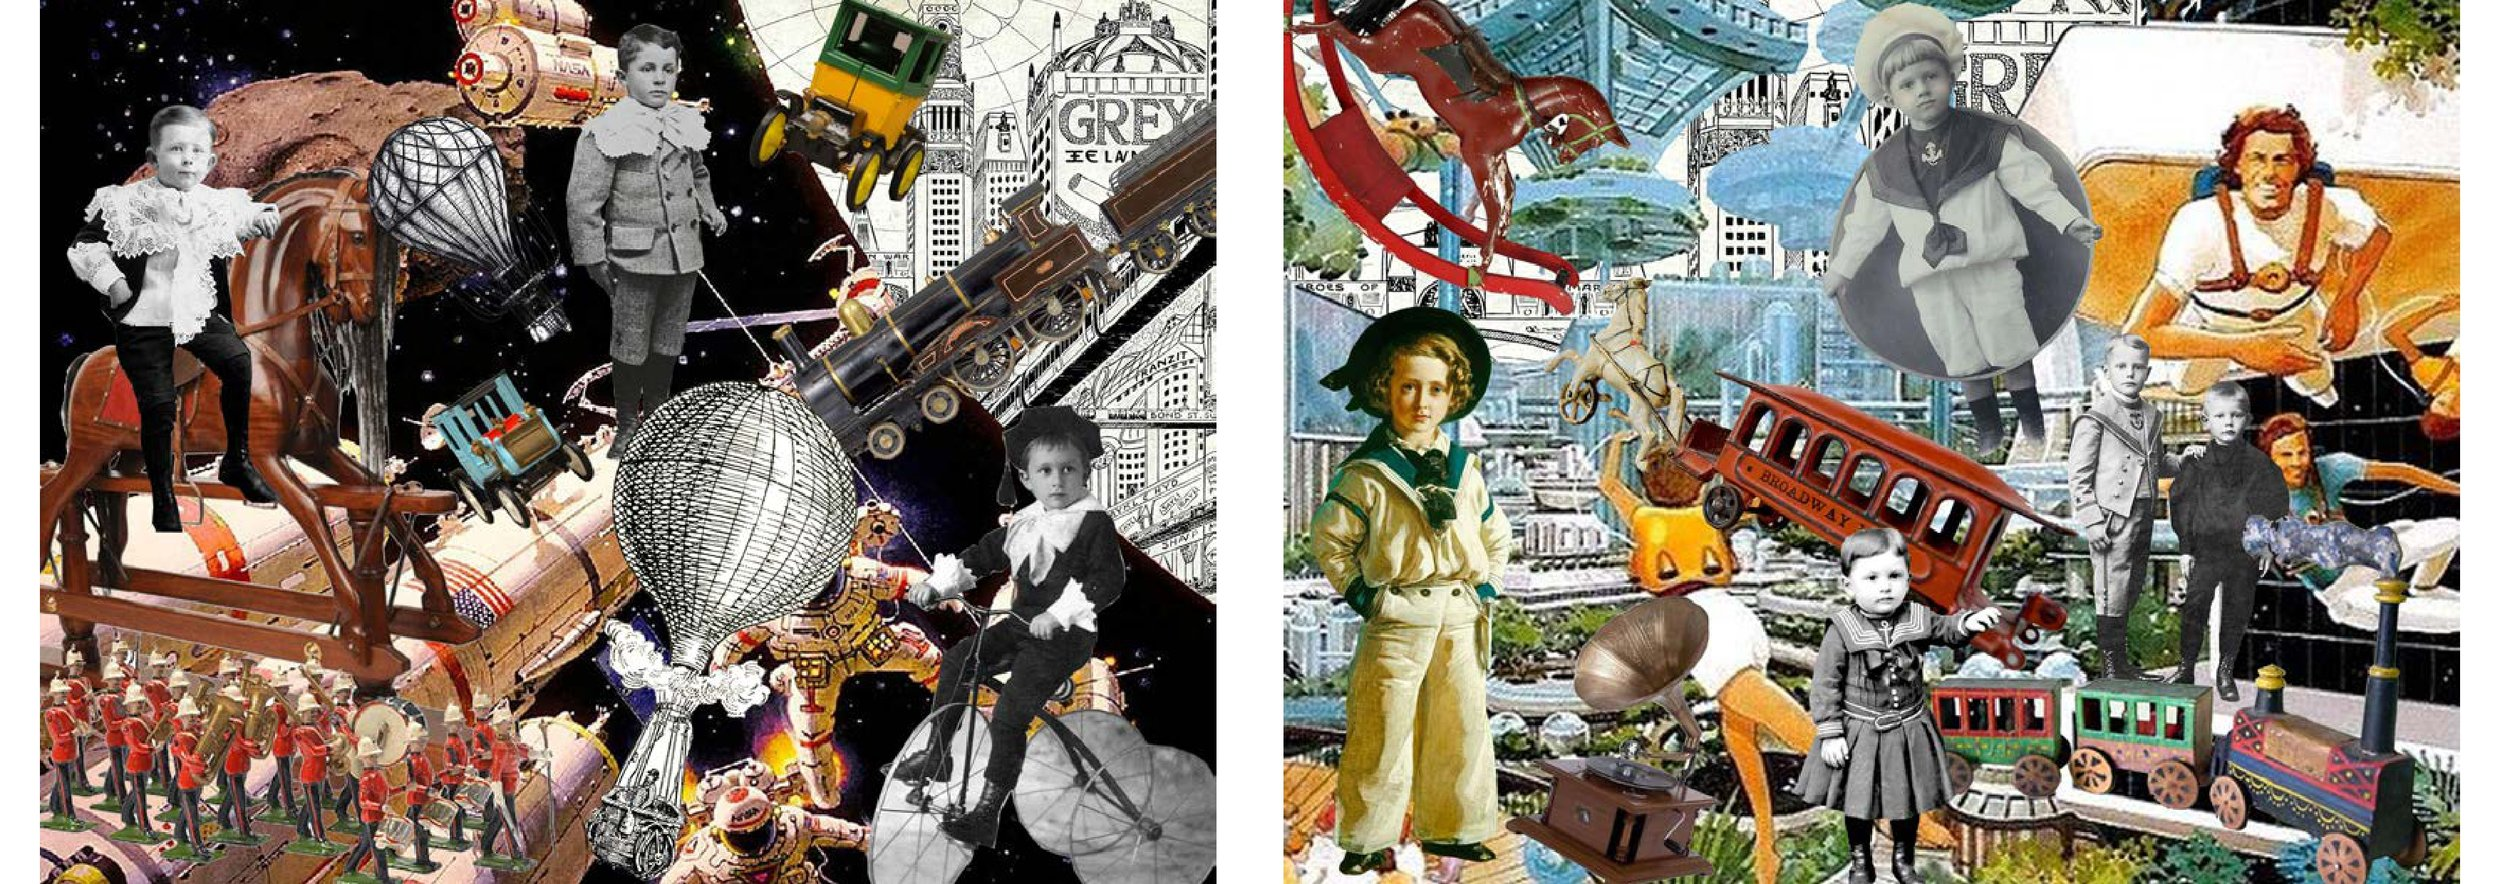 Tomorrowland(portfolio)_page-0007.jpg